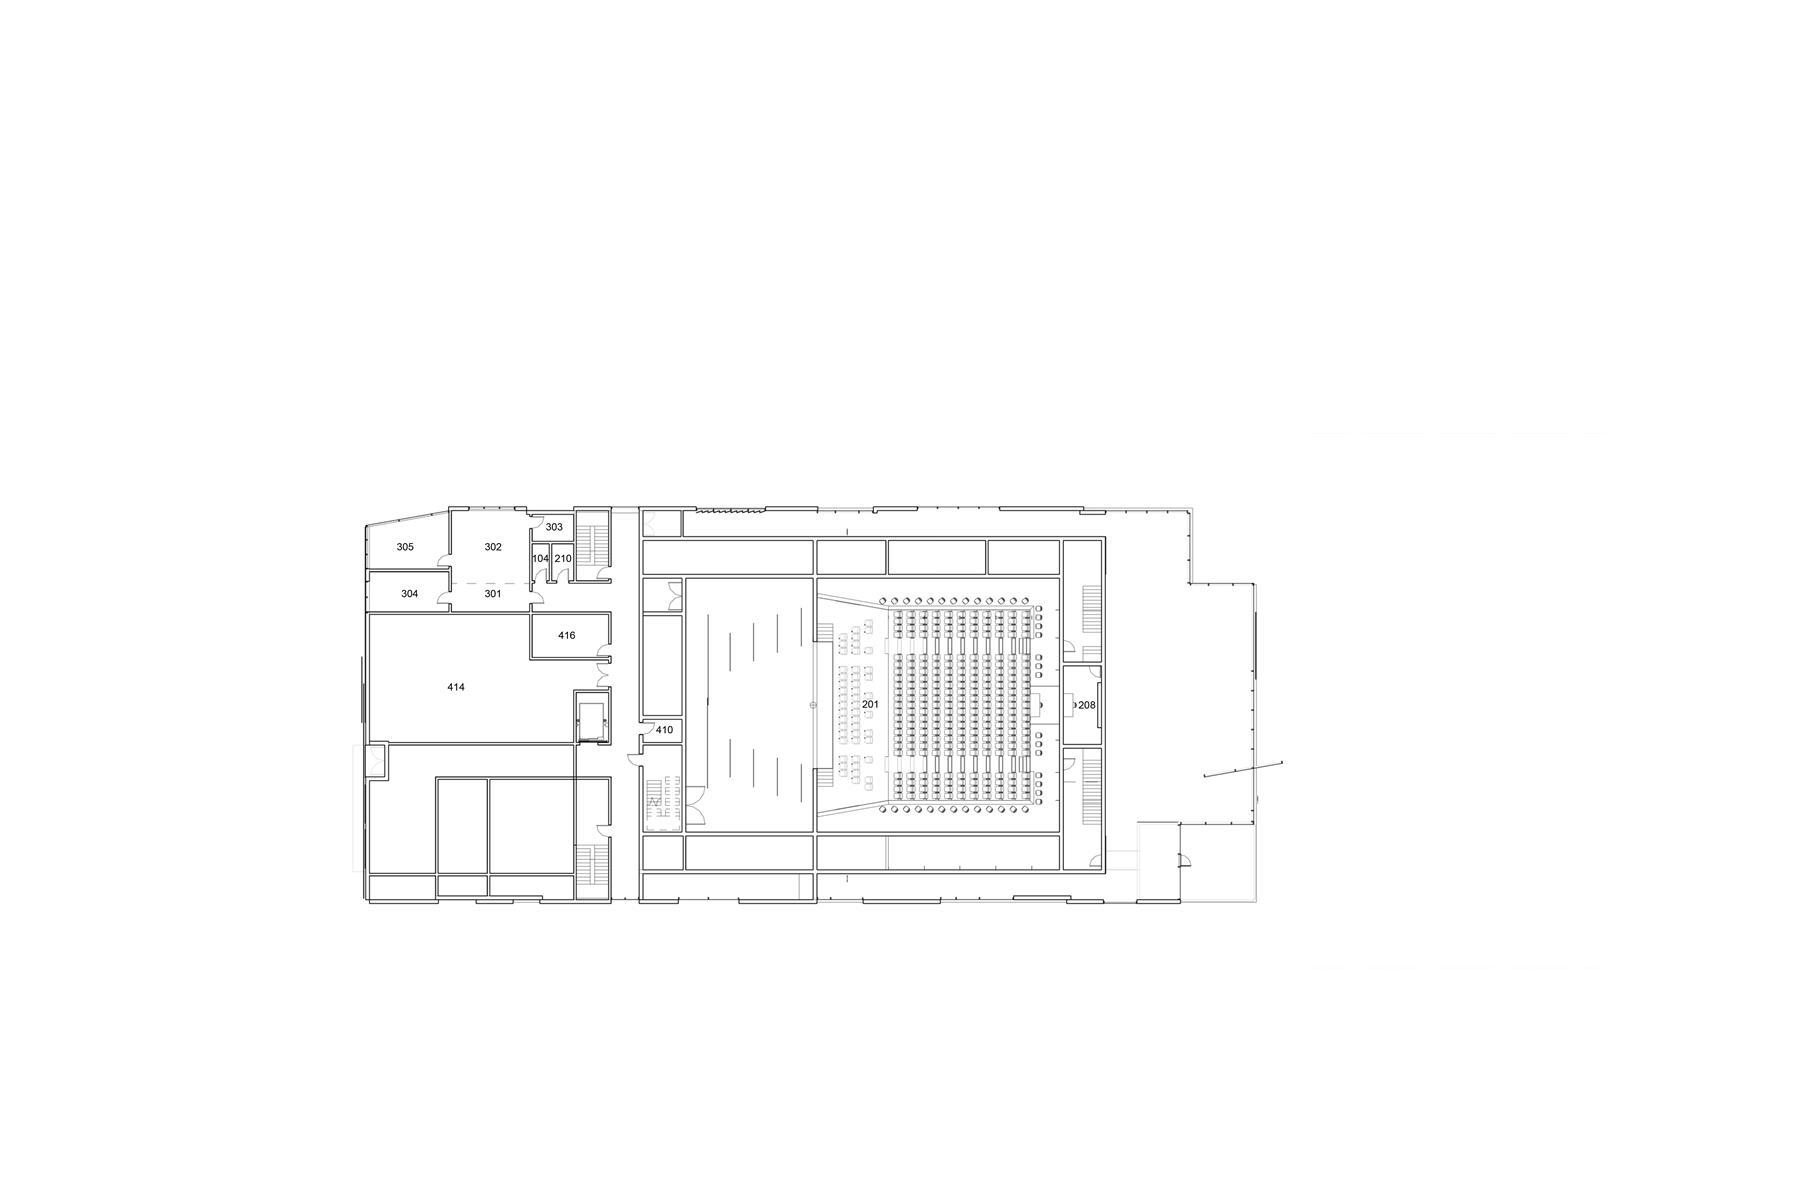 REPT-plan-02_1815x1200.jpg